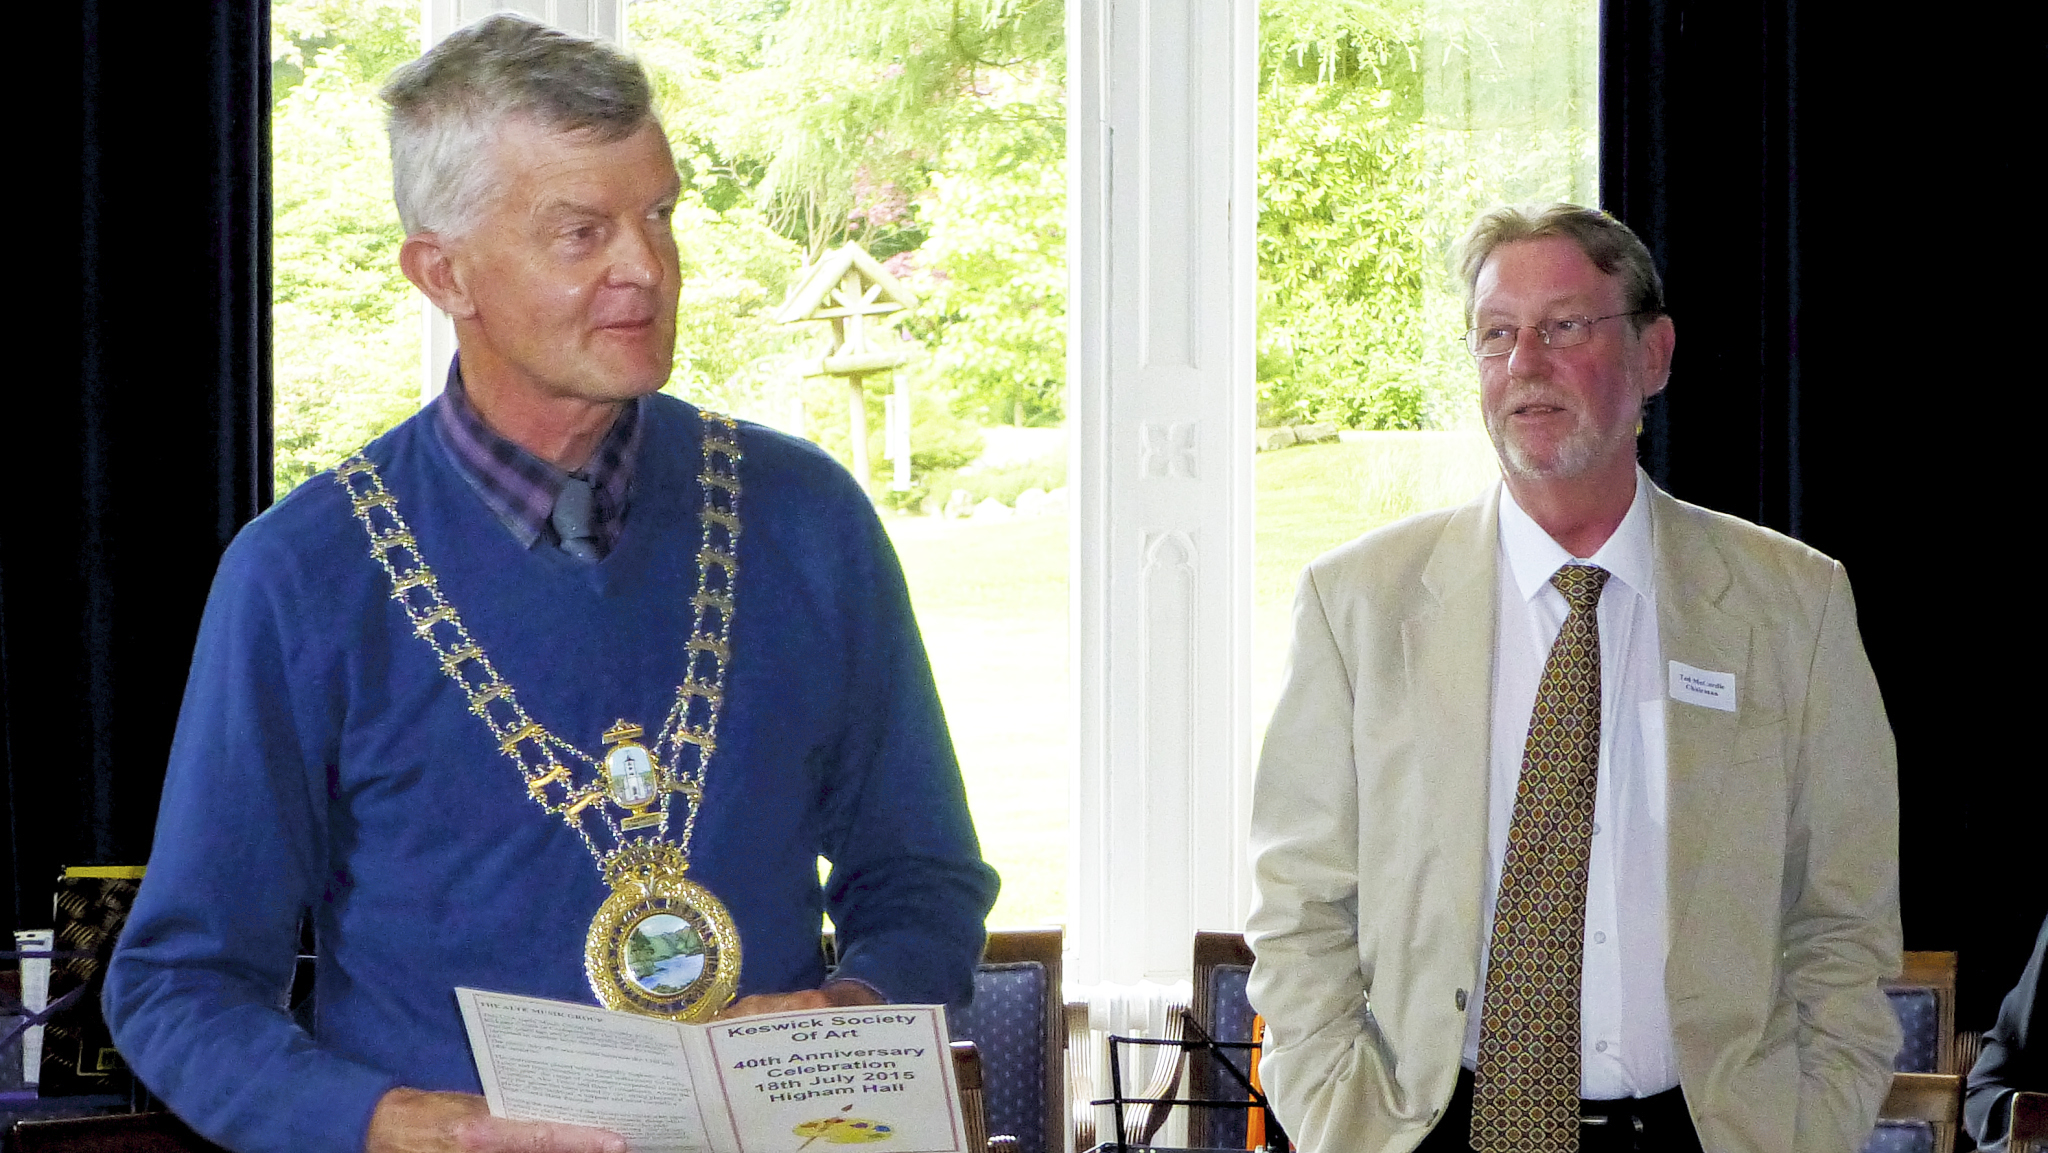 The Mayor opens the proceedings